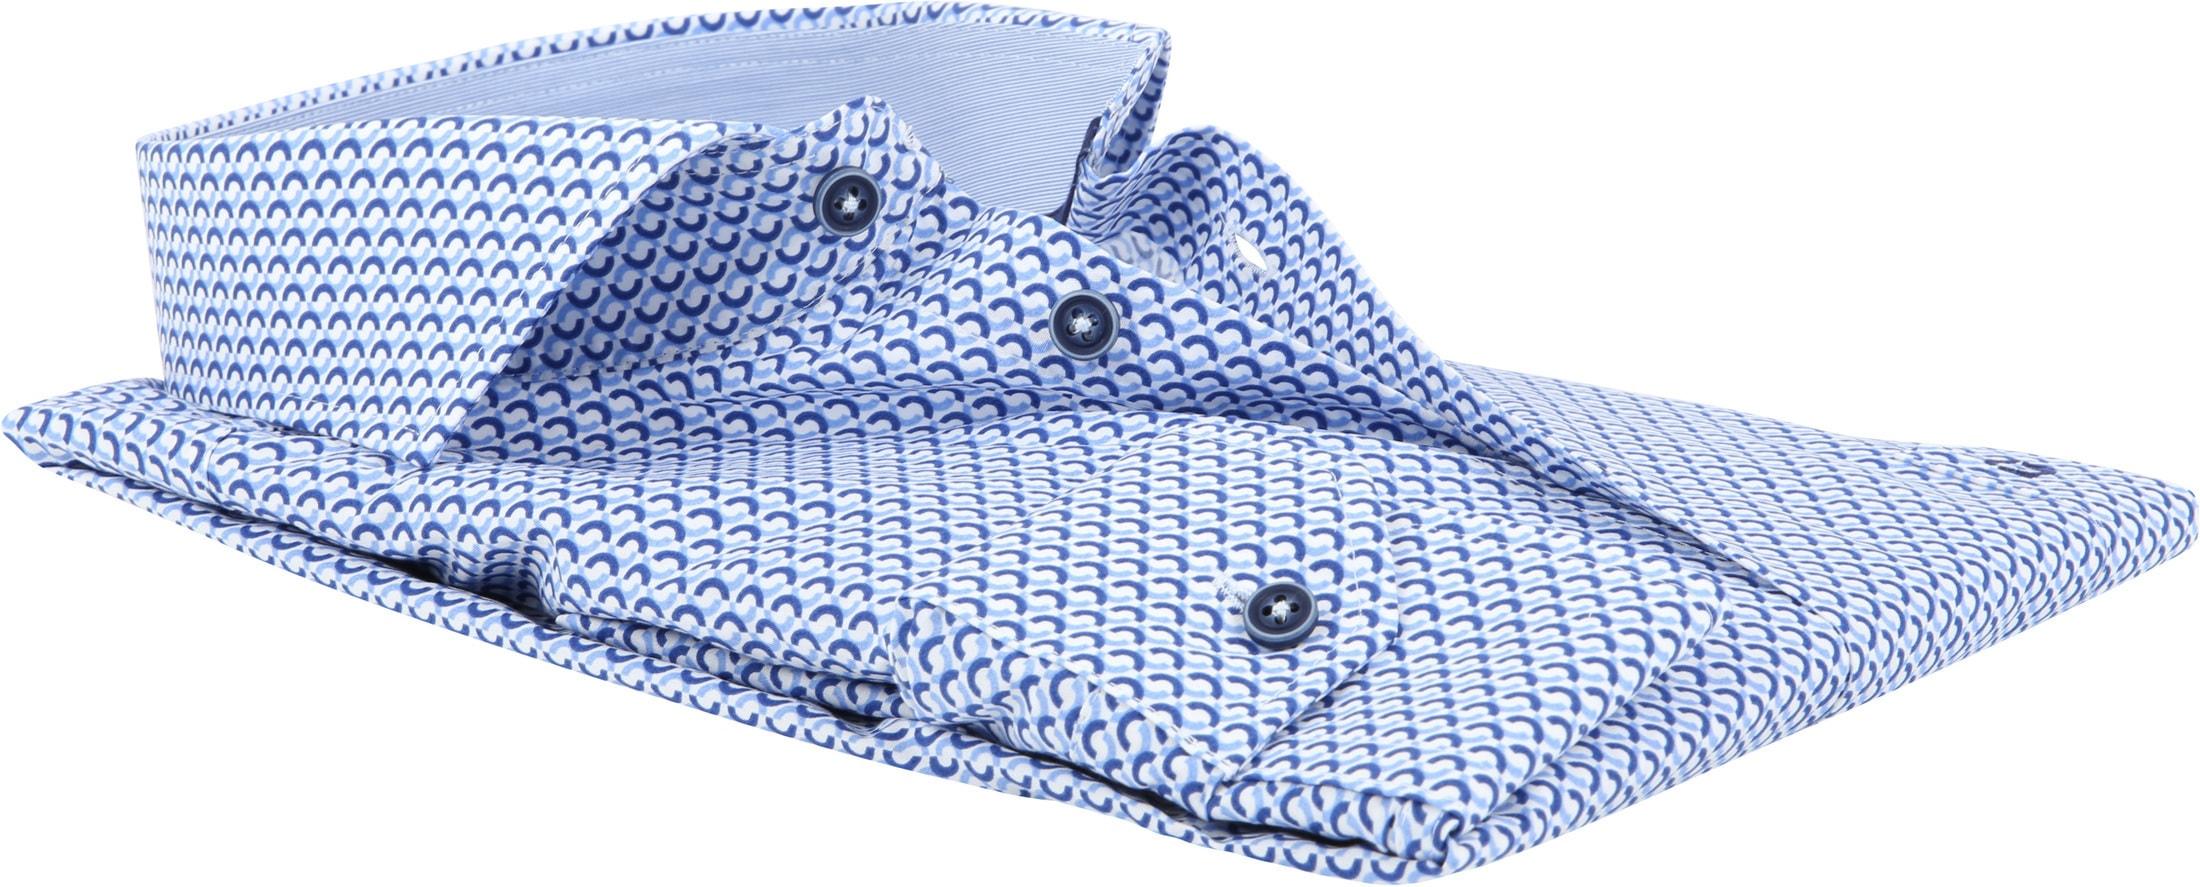 Ledub Overhemd Blauw Patroon foto 3